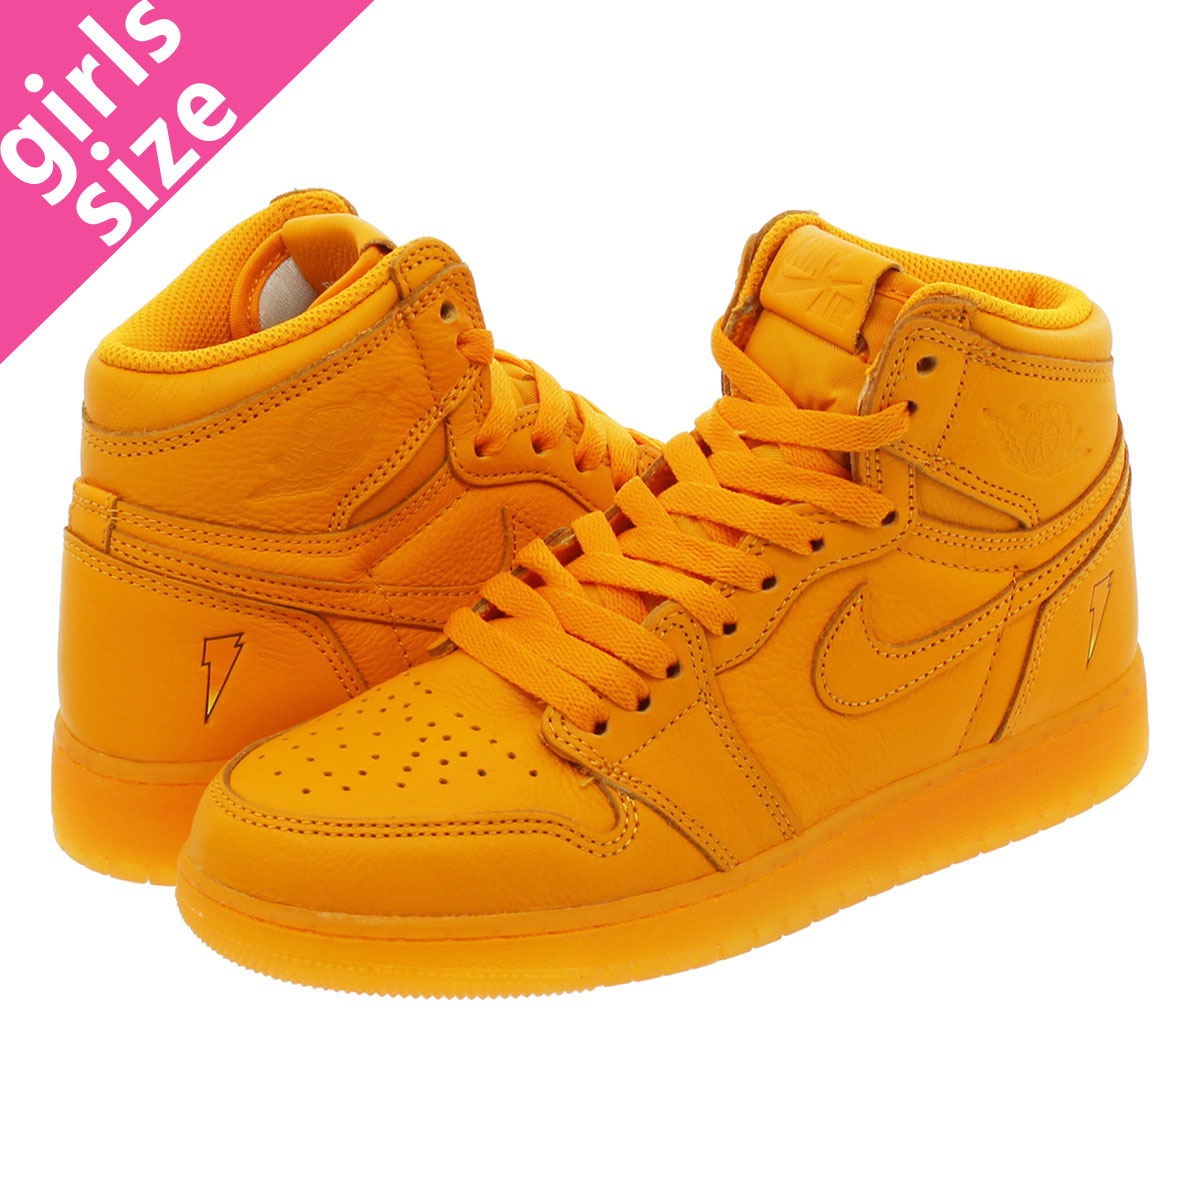 super popular c1aae 5bedd NIKE AIR JORDAN 1 RETRO HIGH OG G8RD BG Nike Air Jordan 1 nostalgic high OG  BG ORANGE PEEL/ORANGE PEEL